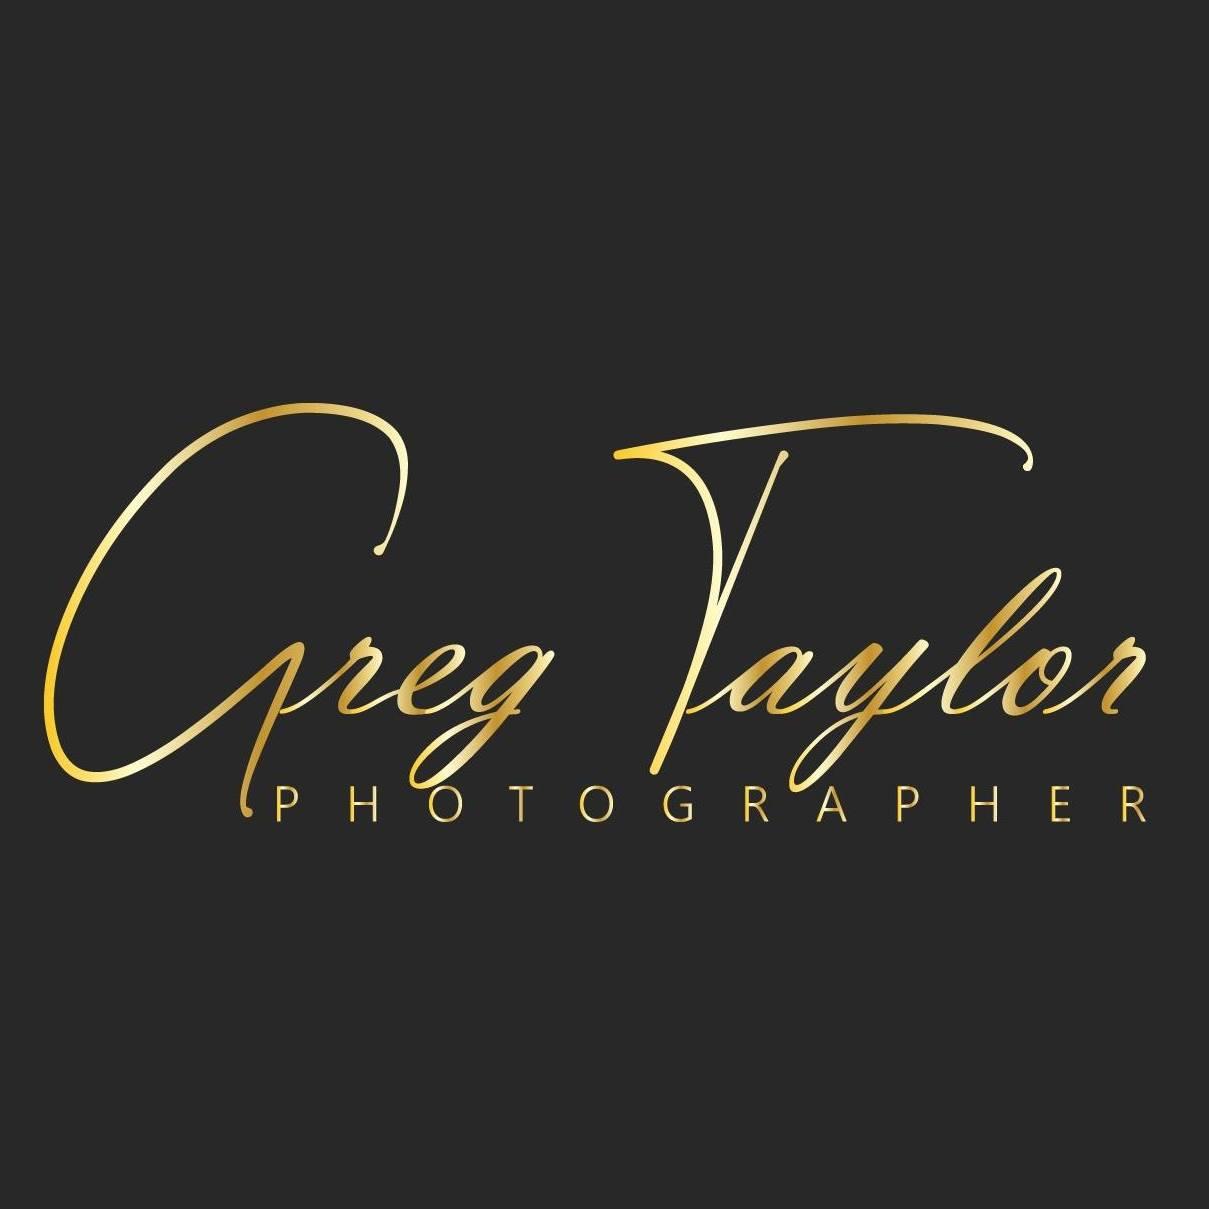 Greg Taylor Photographer | Weddings, Dance, Portraits